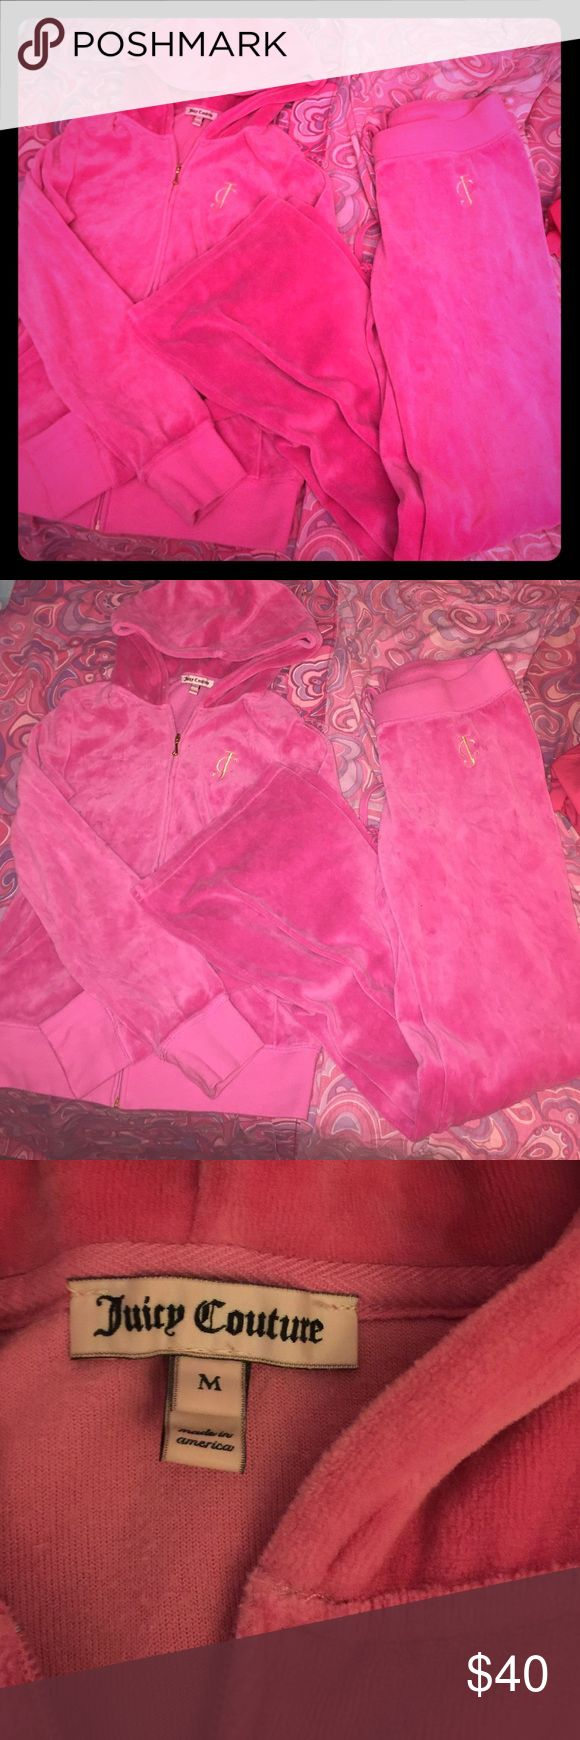 Juicy Couture Sweatsuit Pink side juicy couture sweatsuit, like NEW! Very comfy✨ Juicy Couture Other